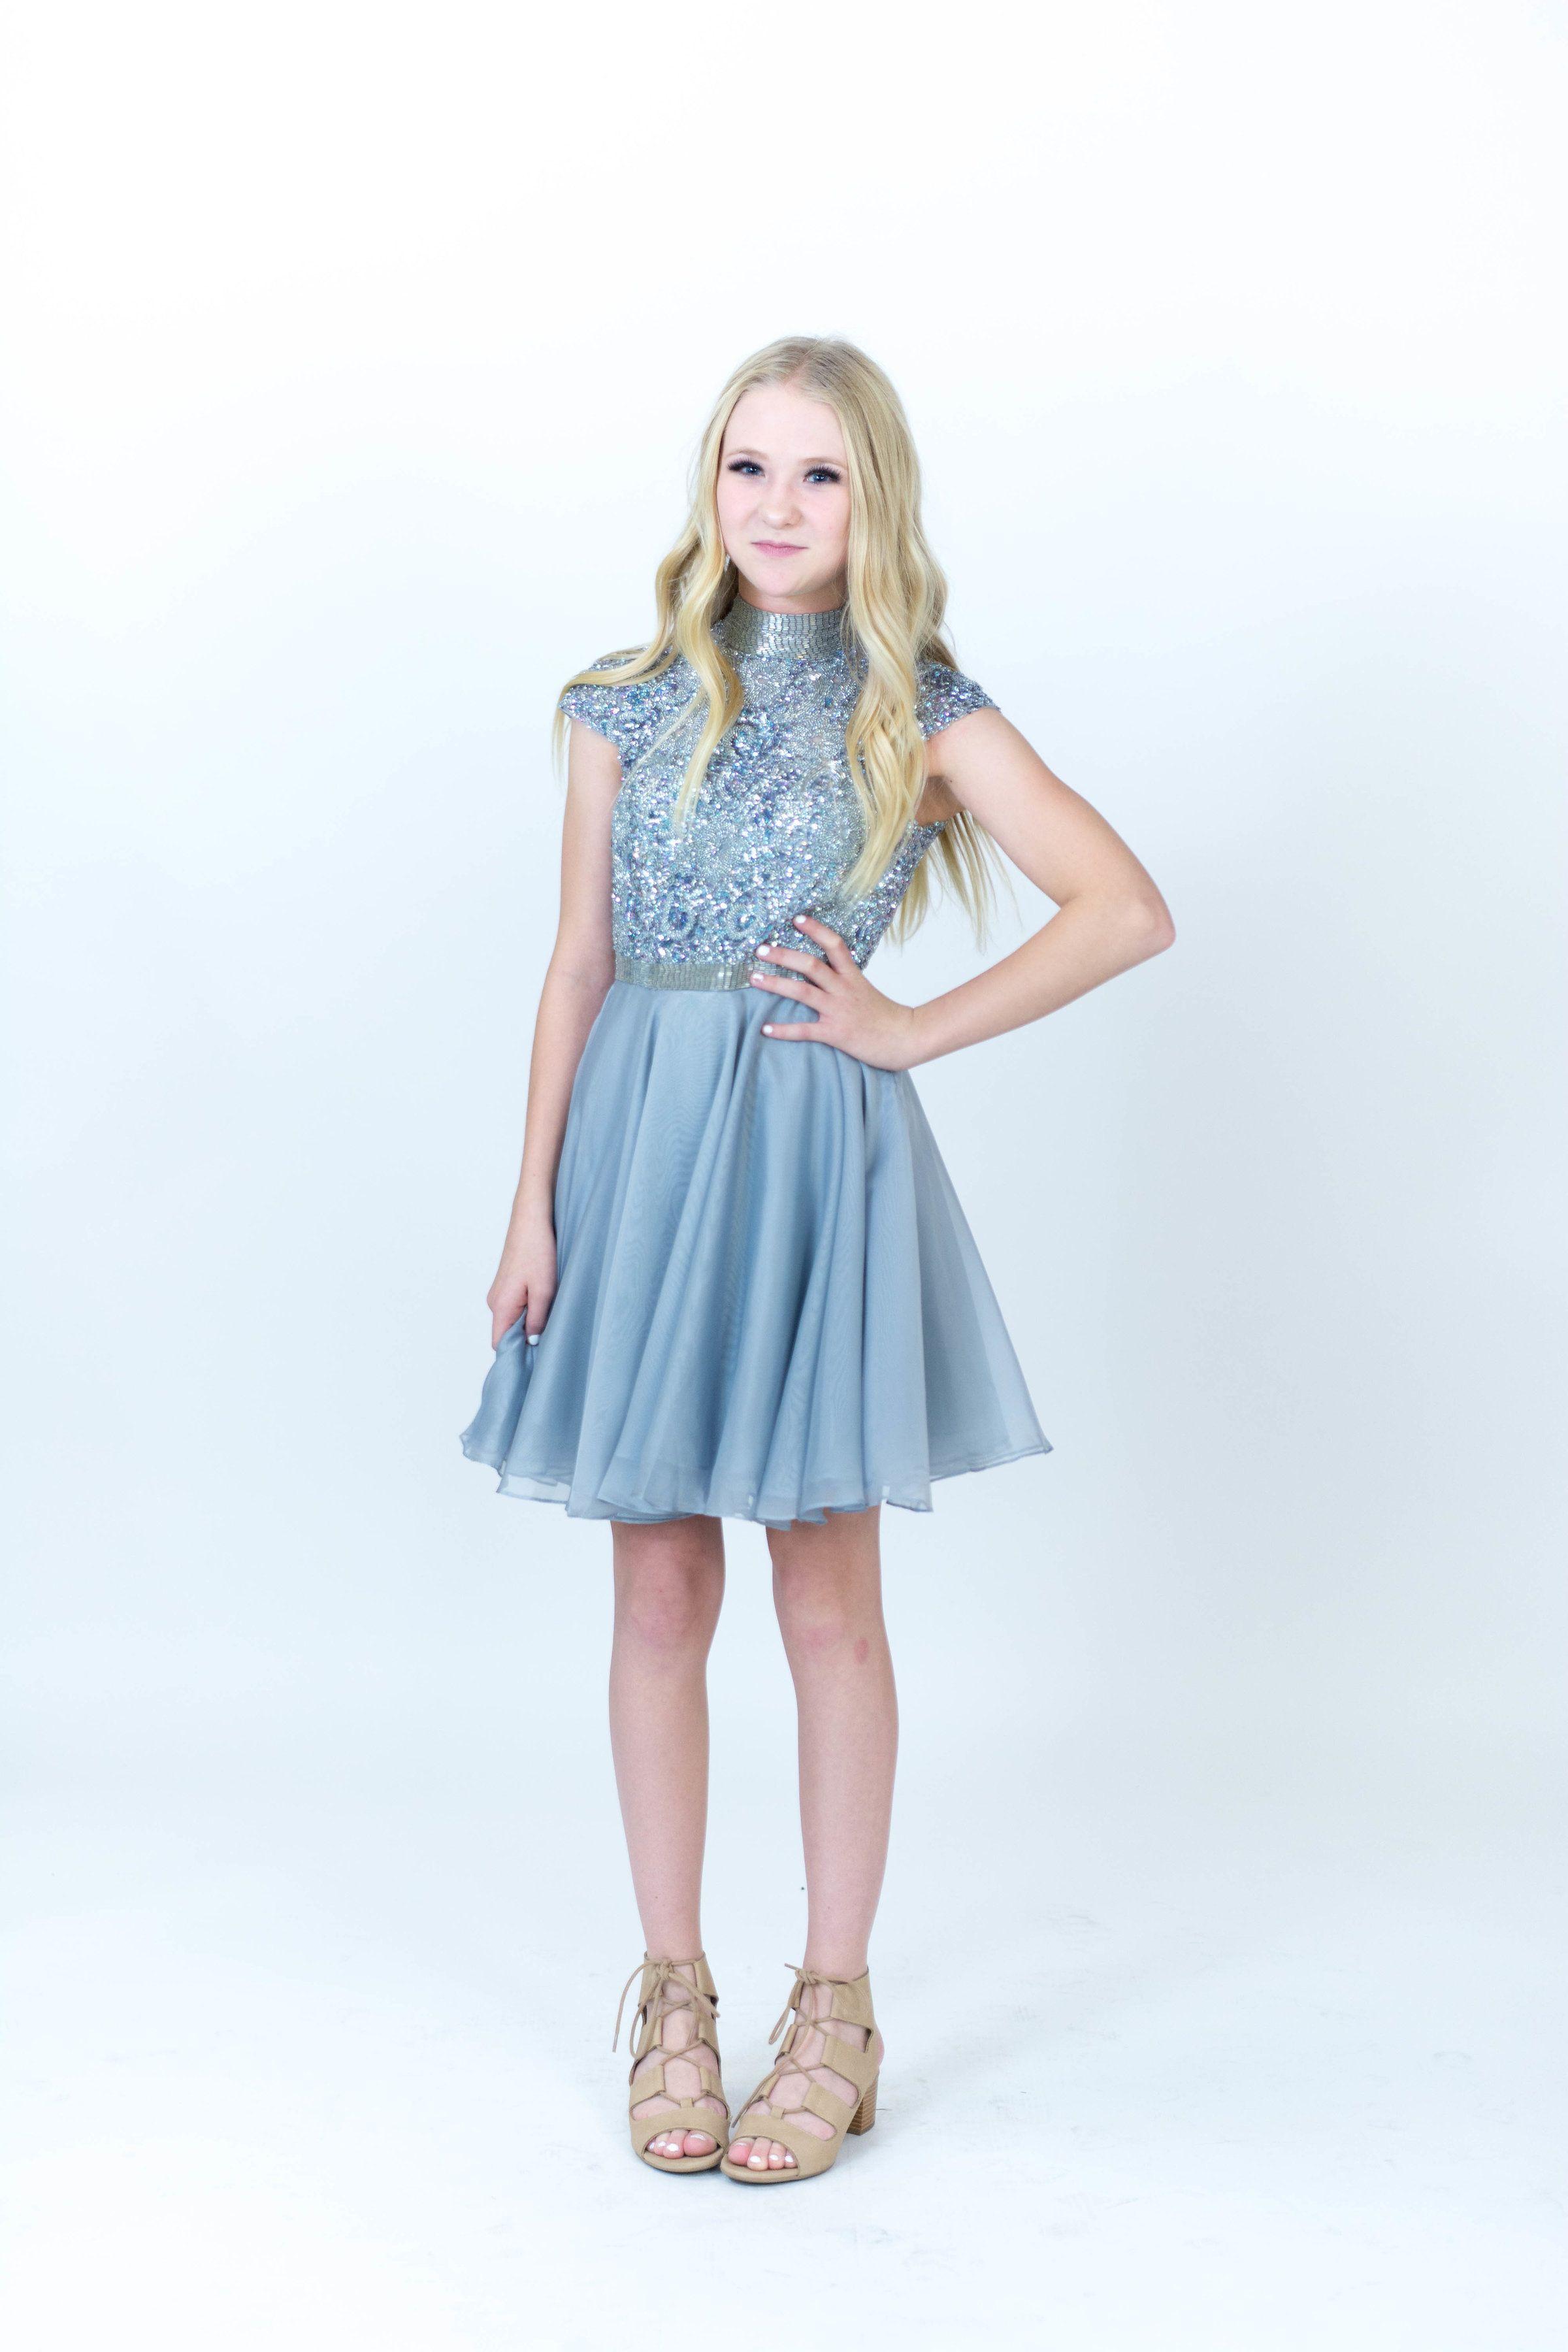 71e90bc700bf Sherri Hill Silver Short Dress Flowy Chiffon Skirt with cap sleeves and  high neckline Ypsilon Dresses